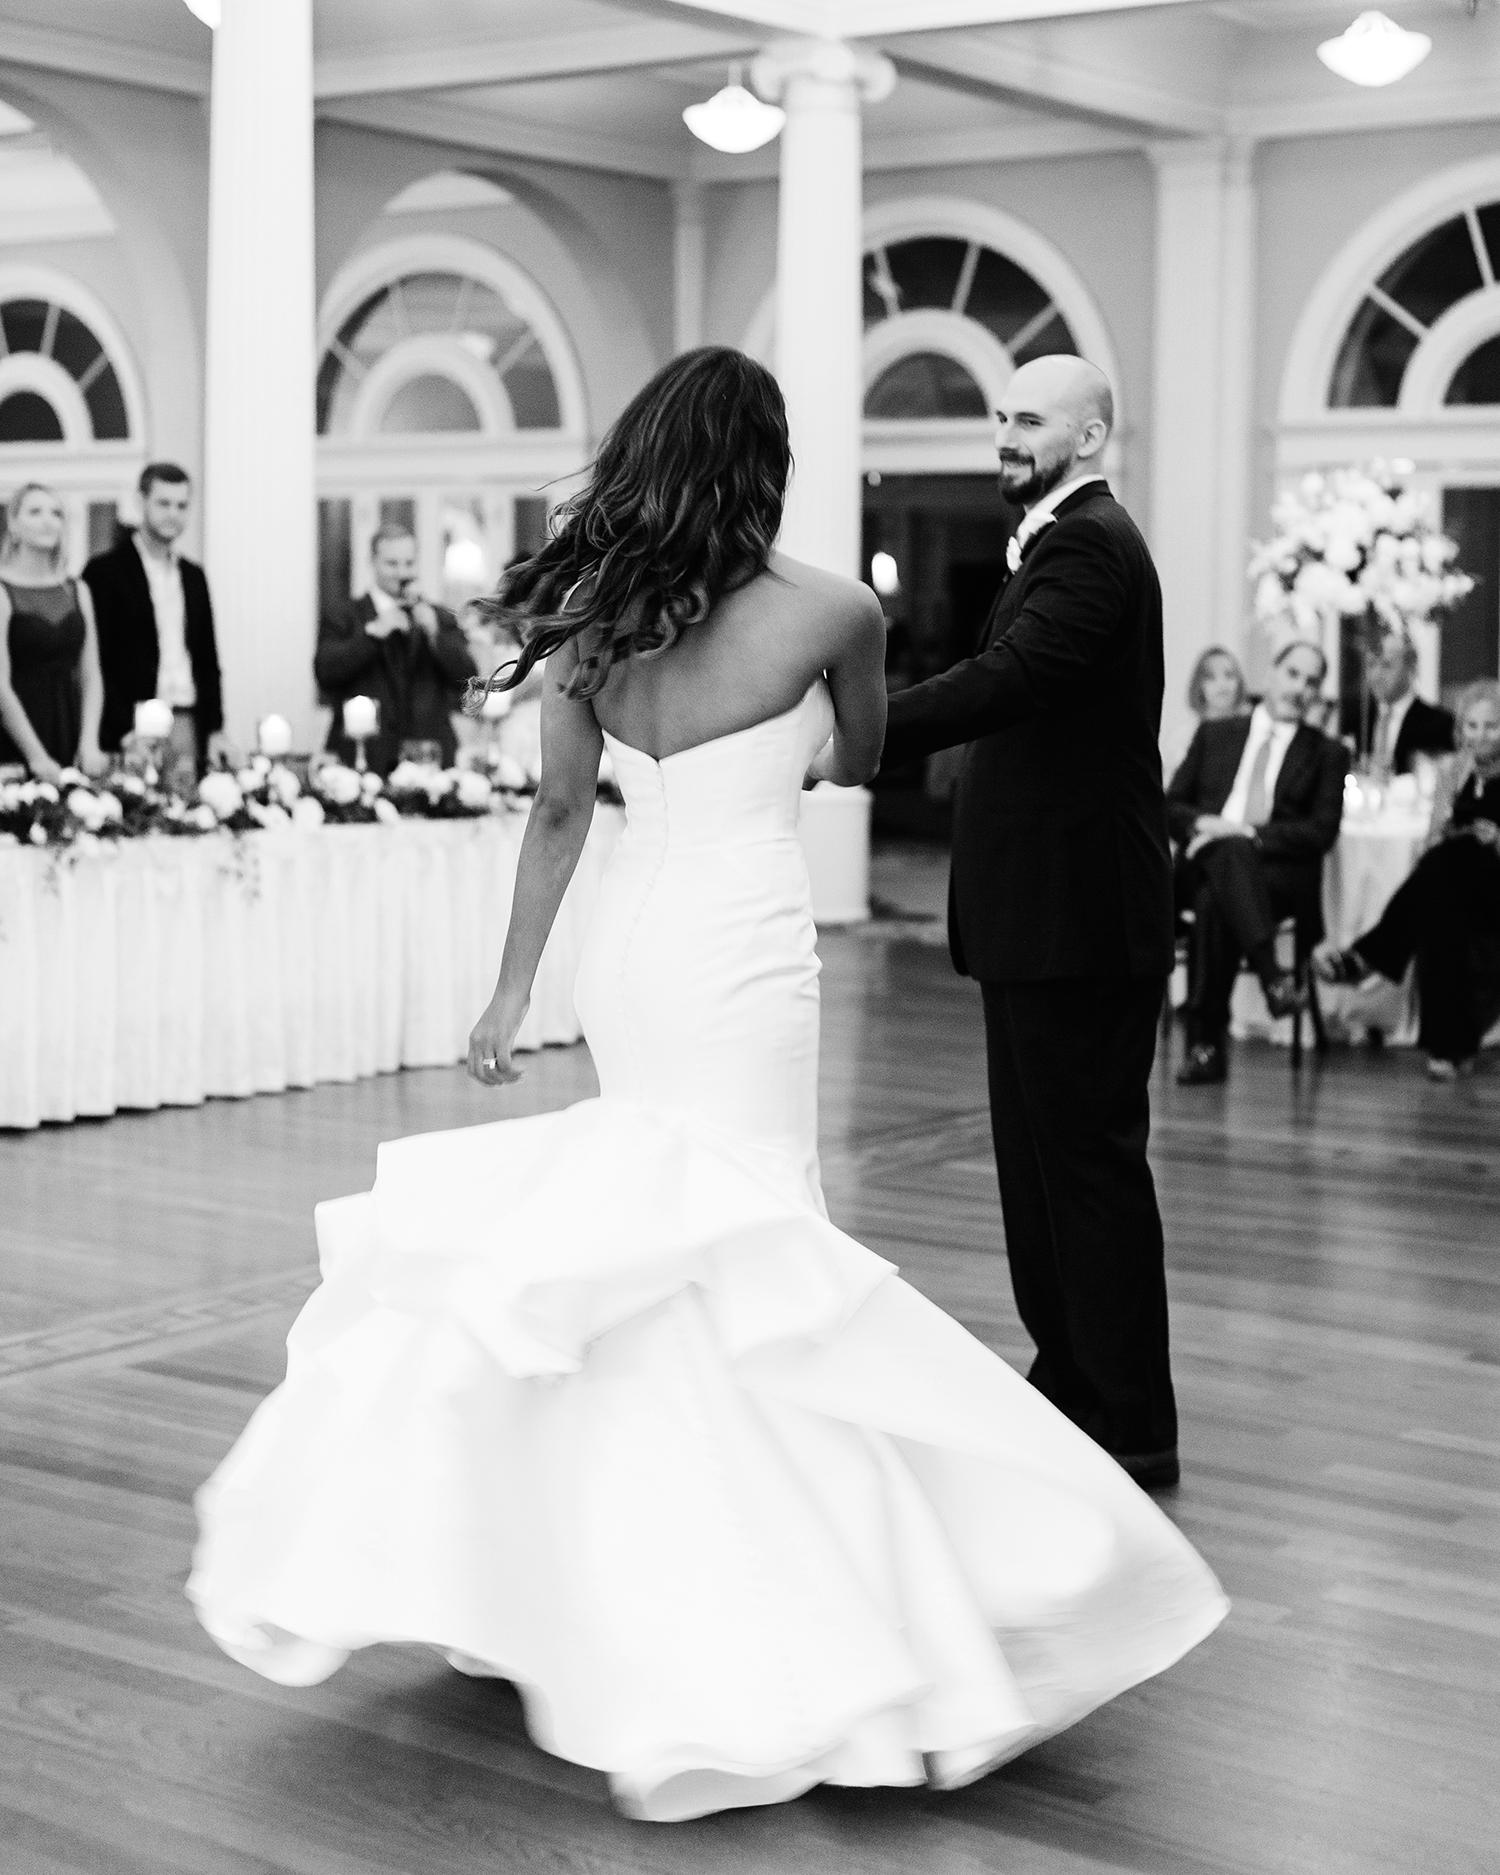 bryanna nick wedding couple first dance reception